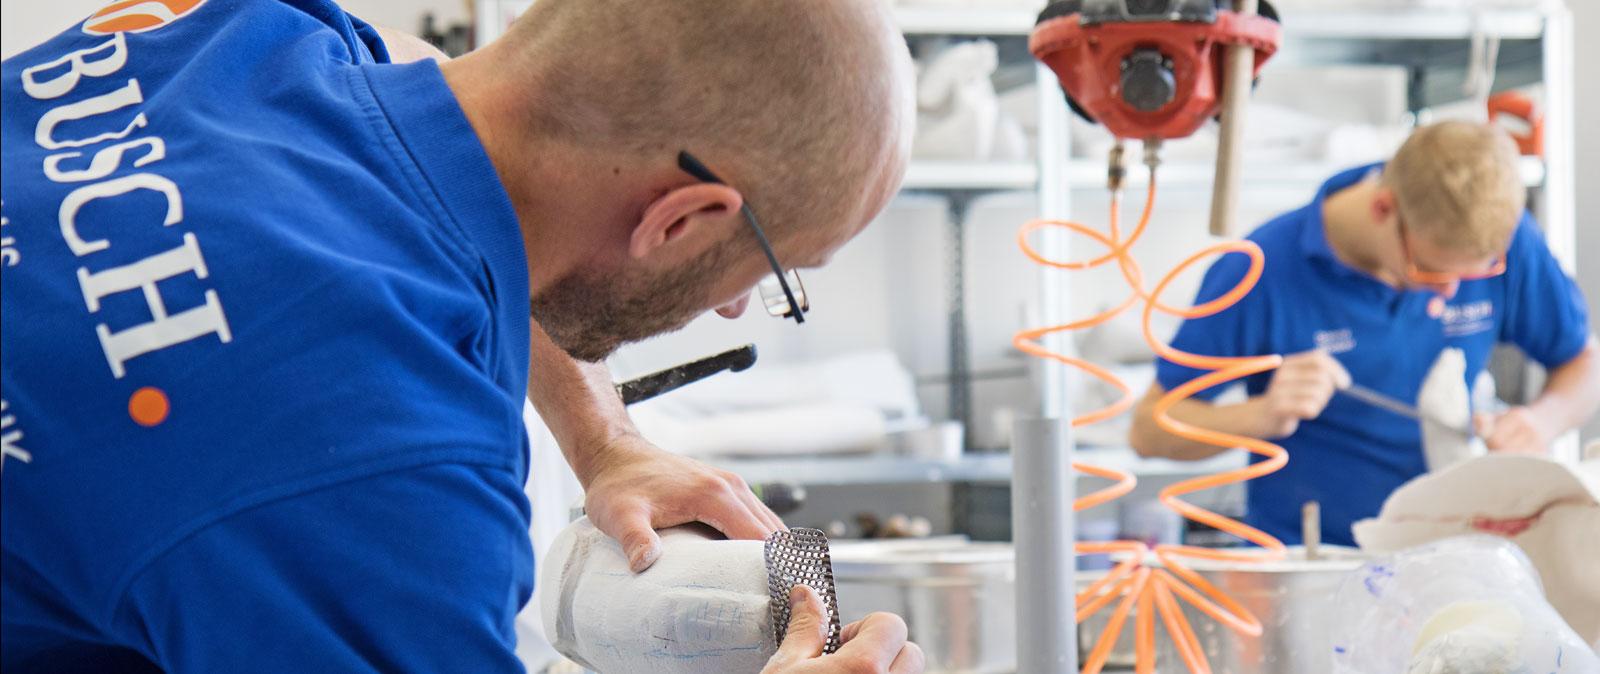 BUSCH. Orthopädietechnik und Sanitätshaus in Halle (Saale) – Silikontechnik